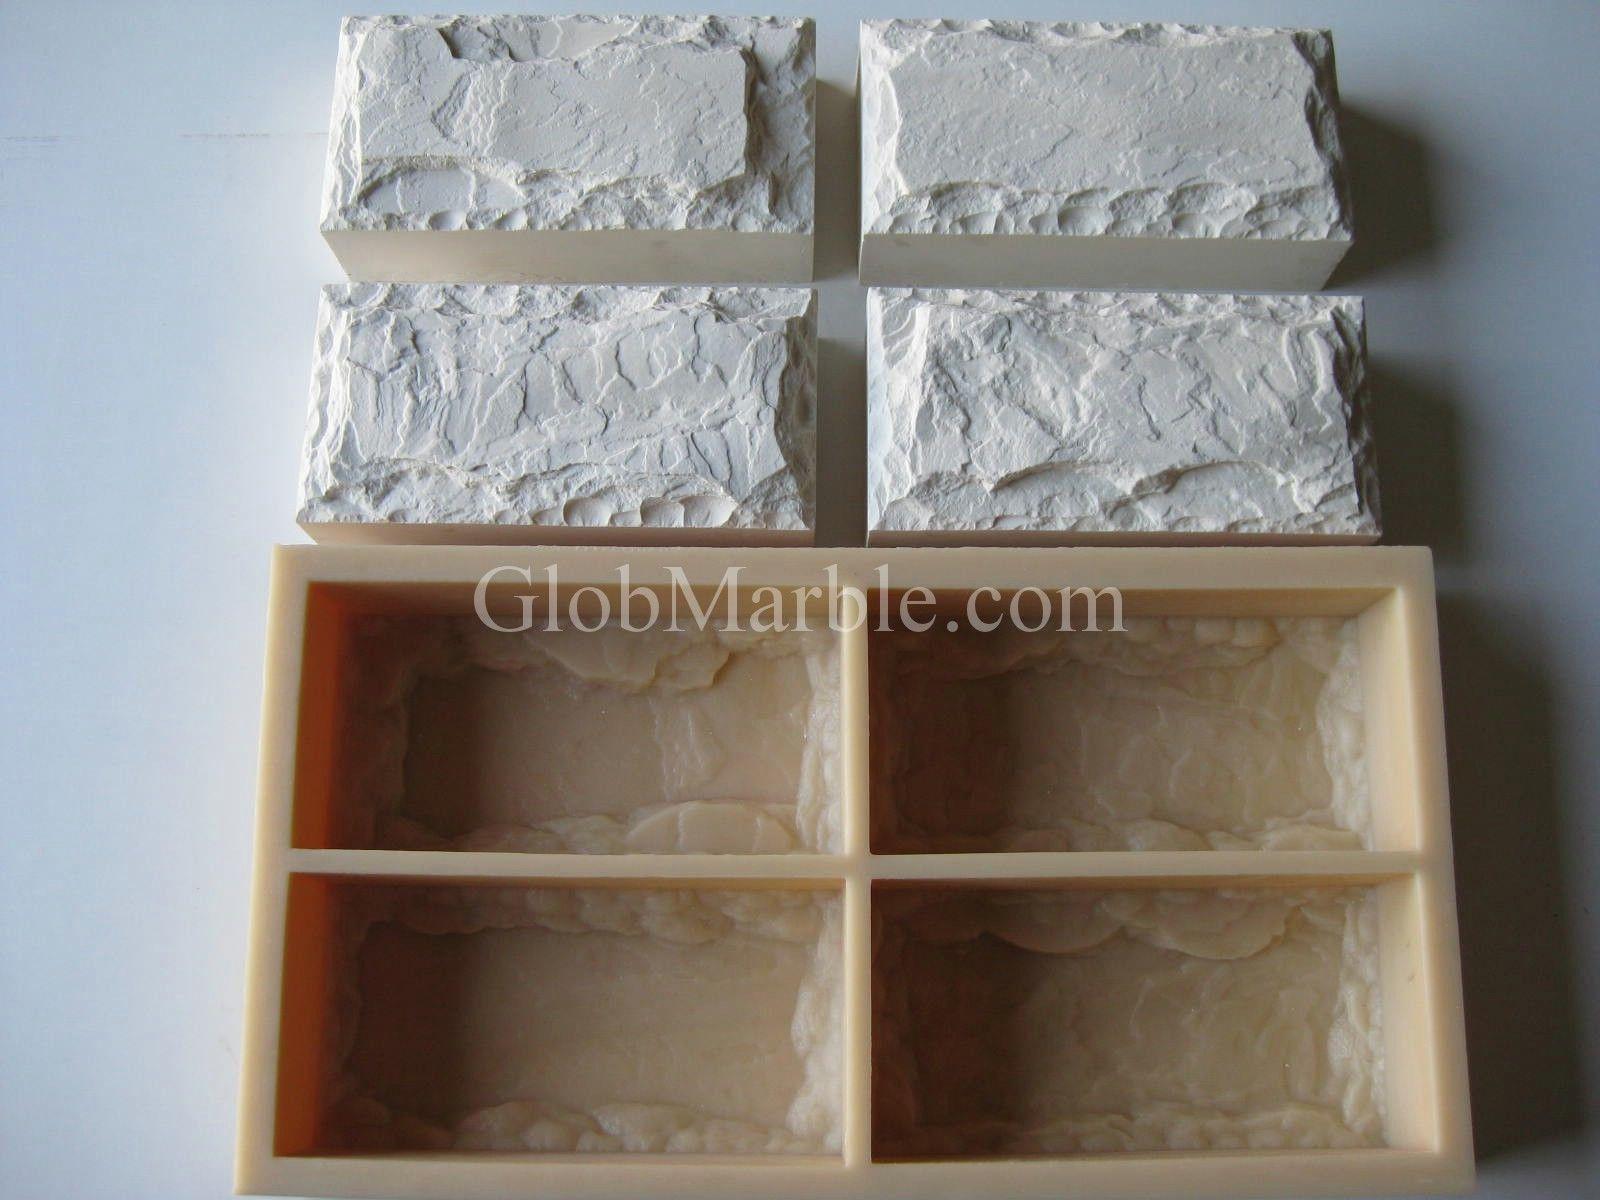 Concrete Mold, Mould Block Cement Form Limestone Mold LS1111 Concrete Stone